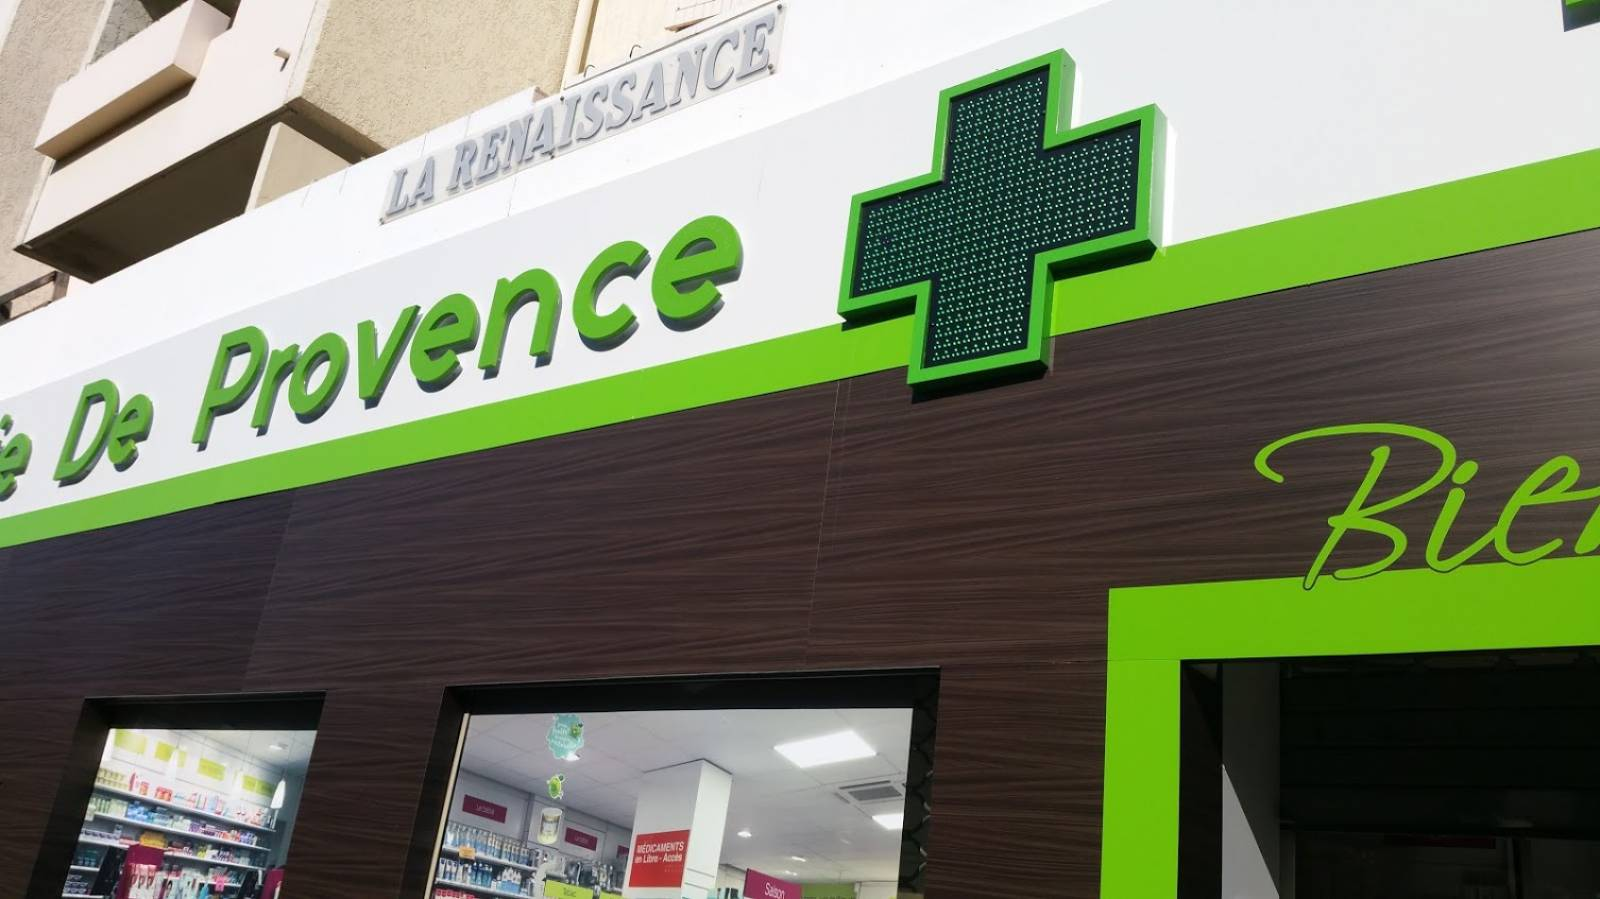 Pharmacie et parapharmacie aubagne pharmacie de provence - Pharmacie garde salon de provence ...